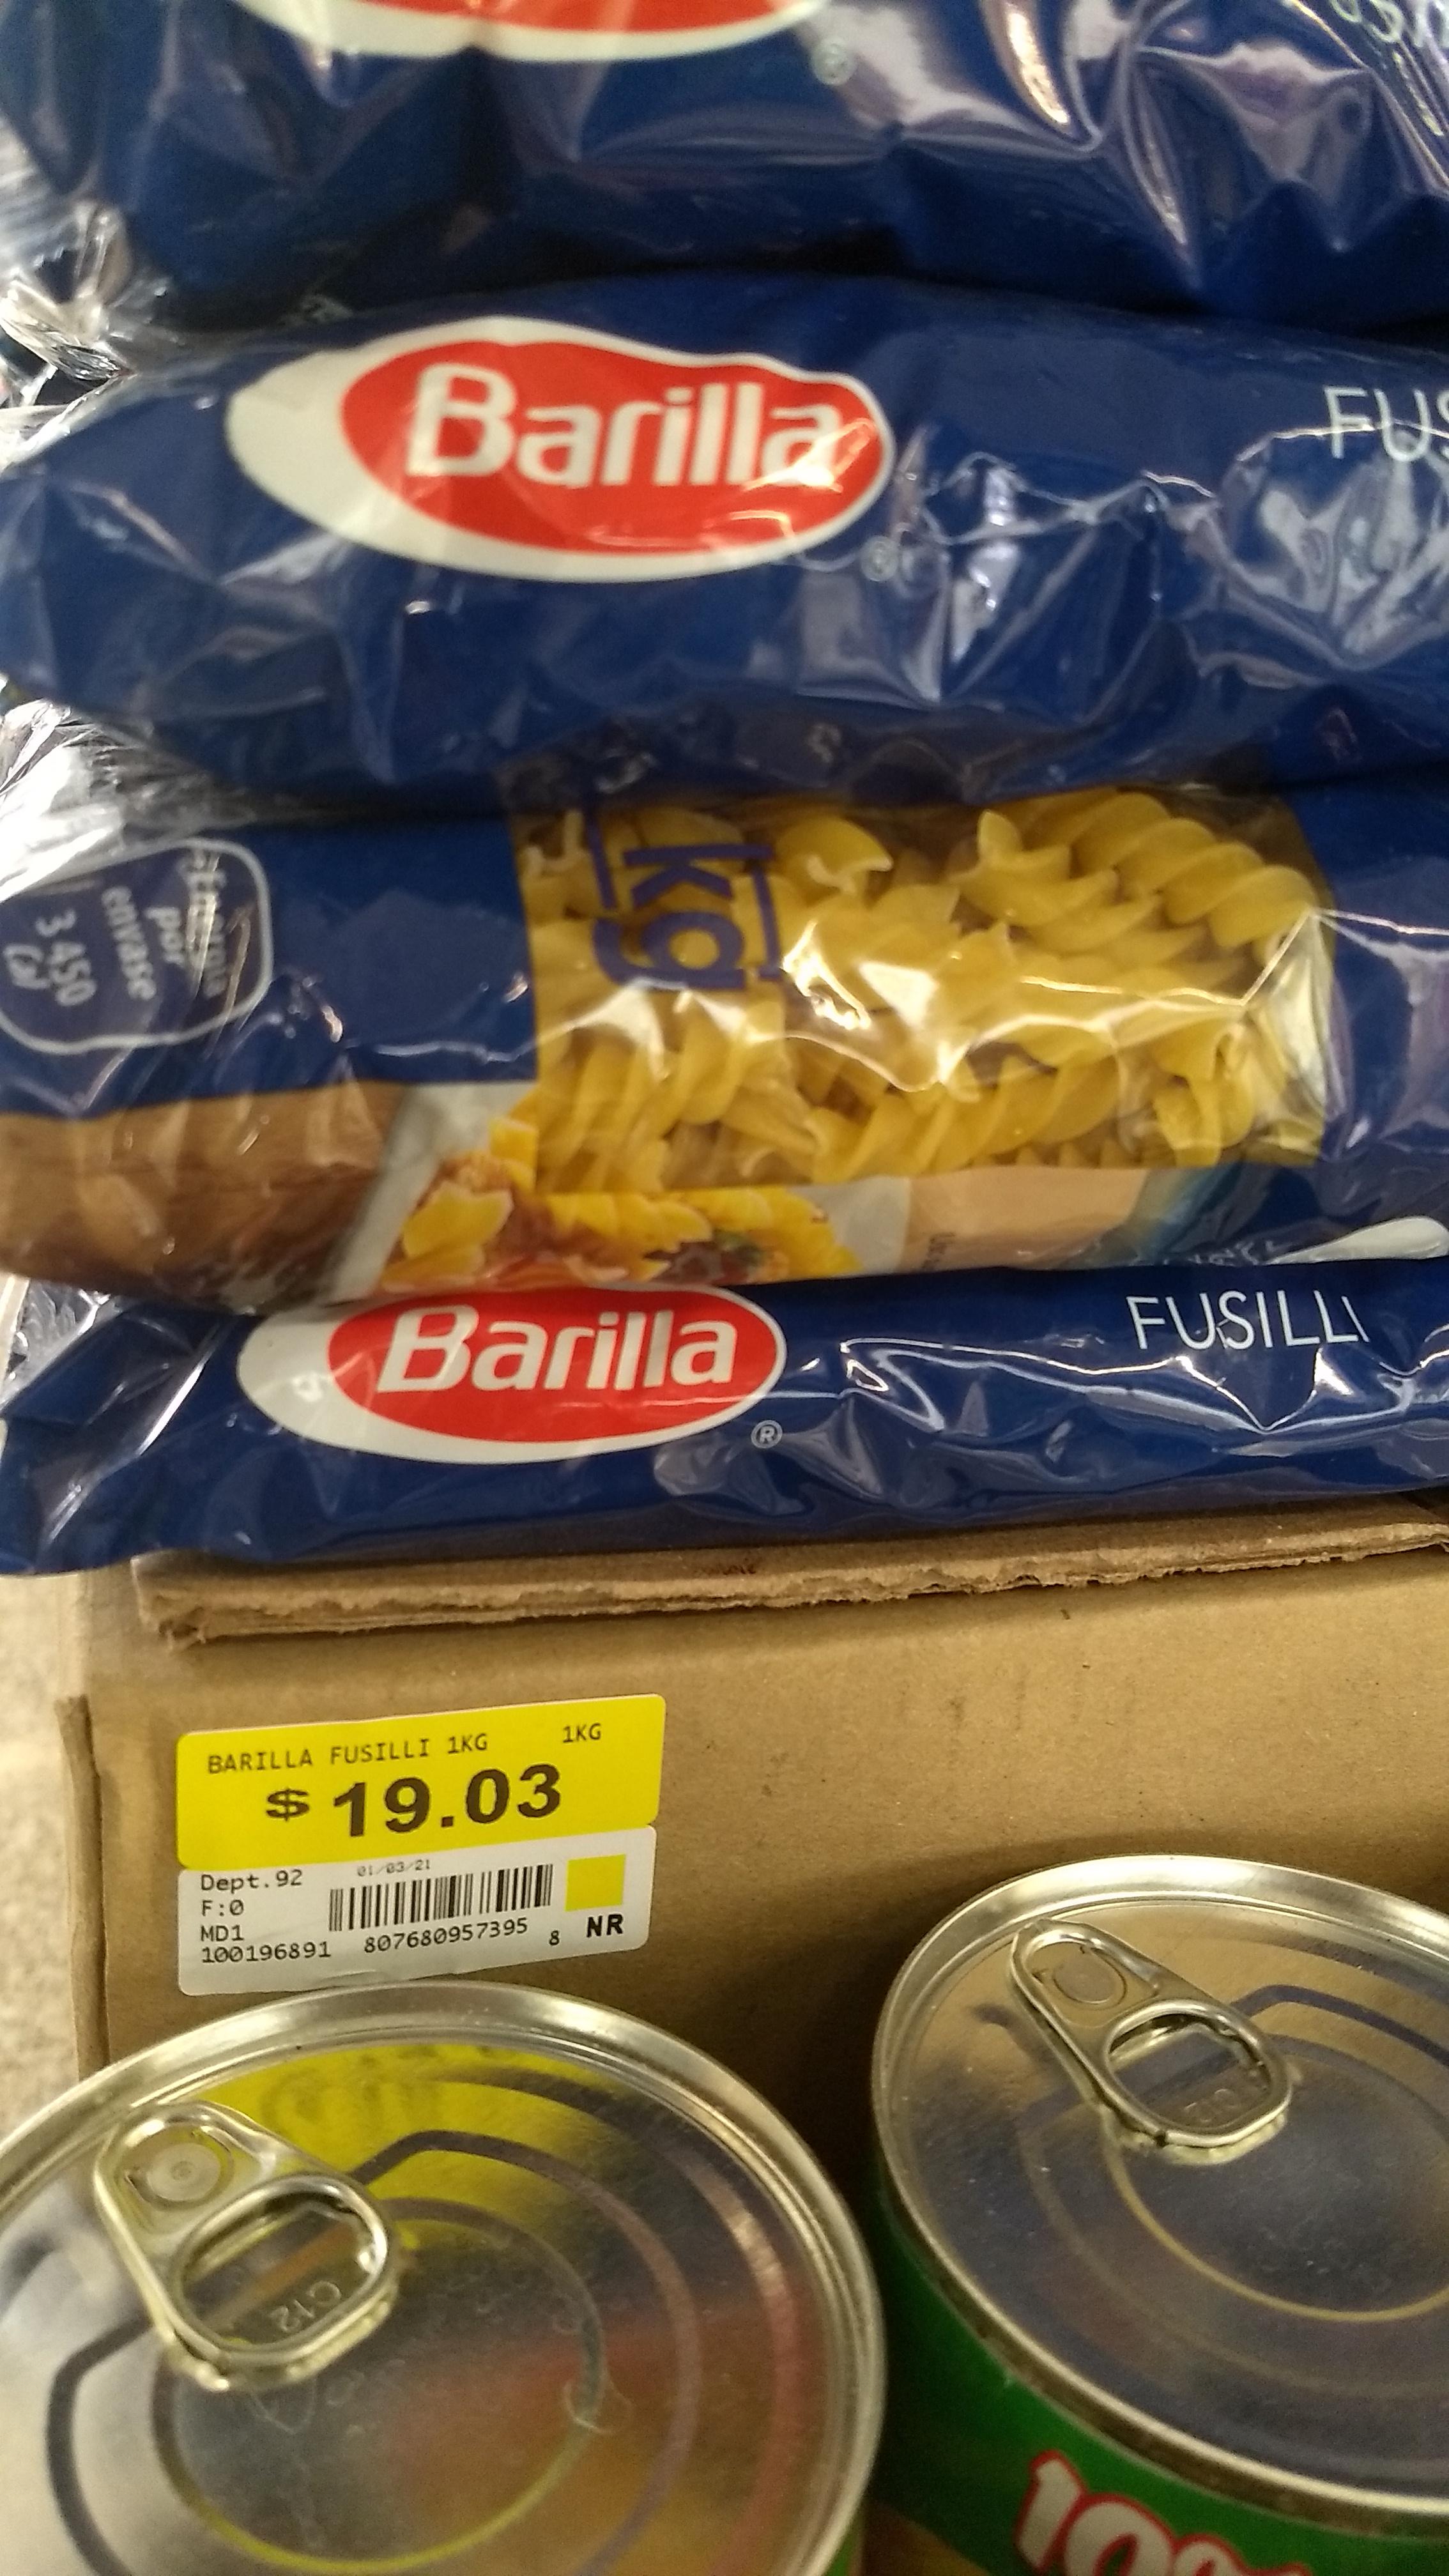 Sopa Barilla Fussili 1kg $19.03 Walmart Taxqueña